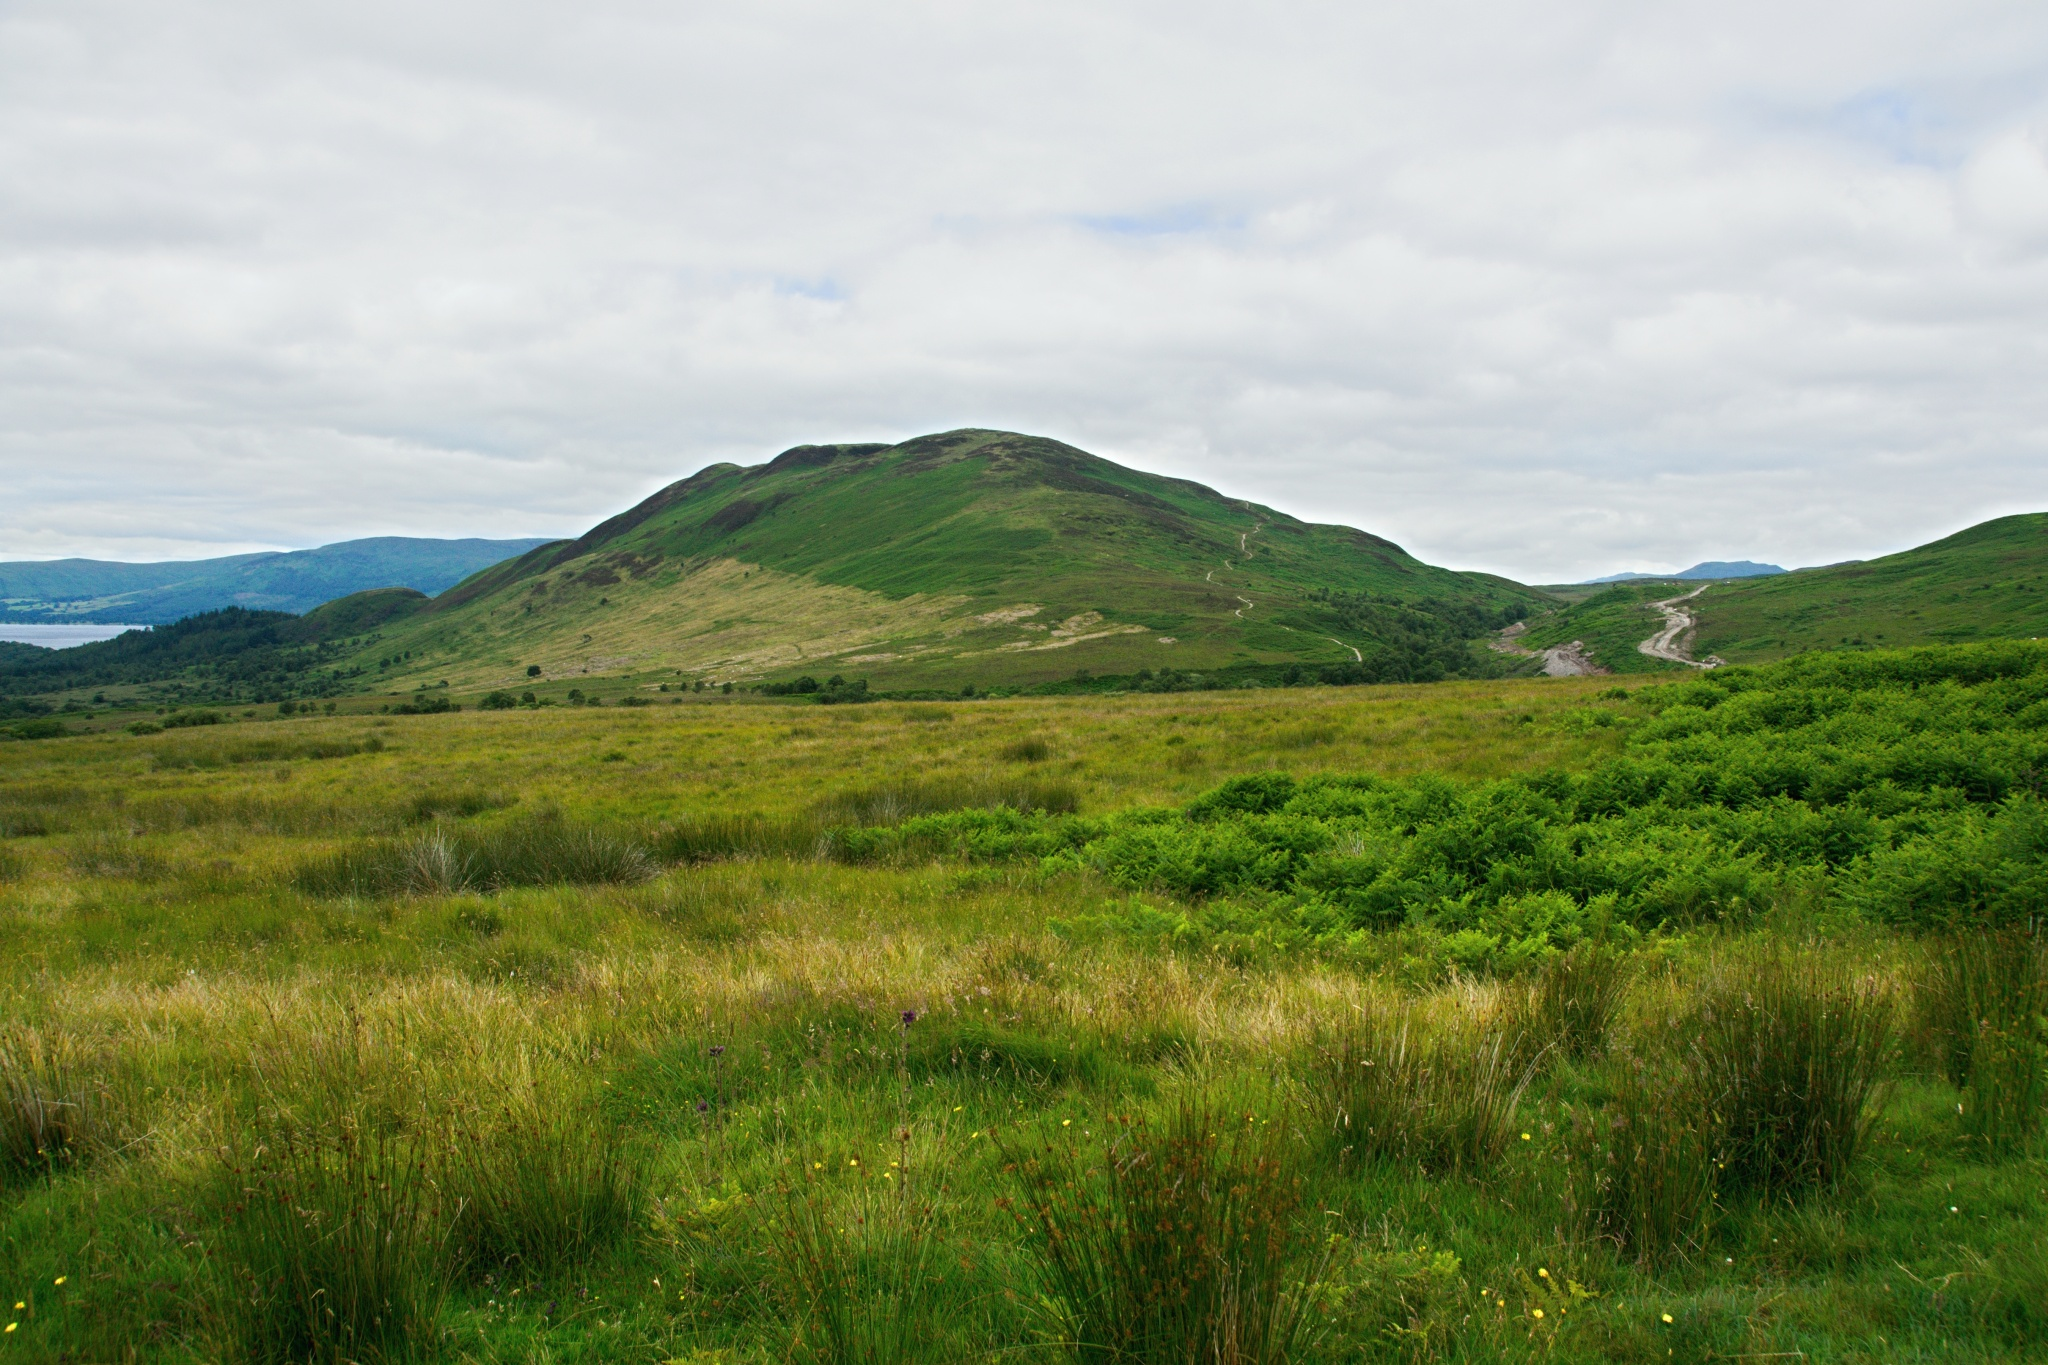 361 metrů vysoký kopec Conic Hill